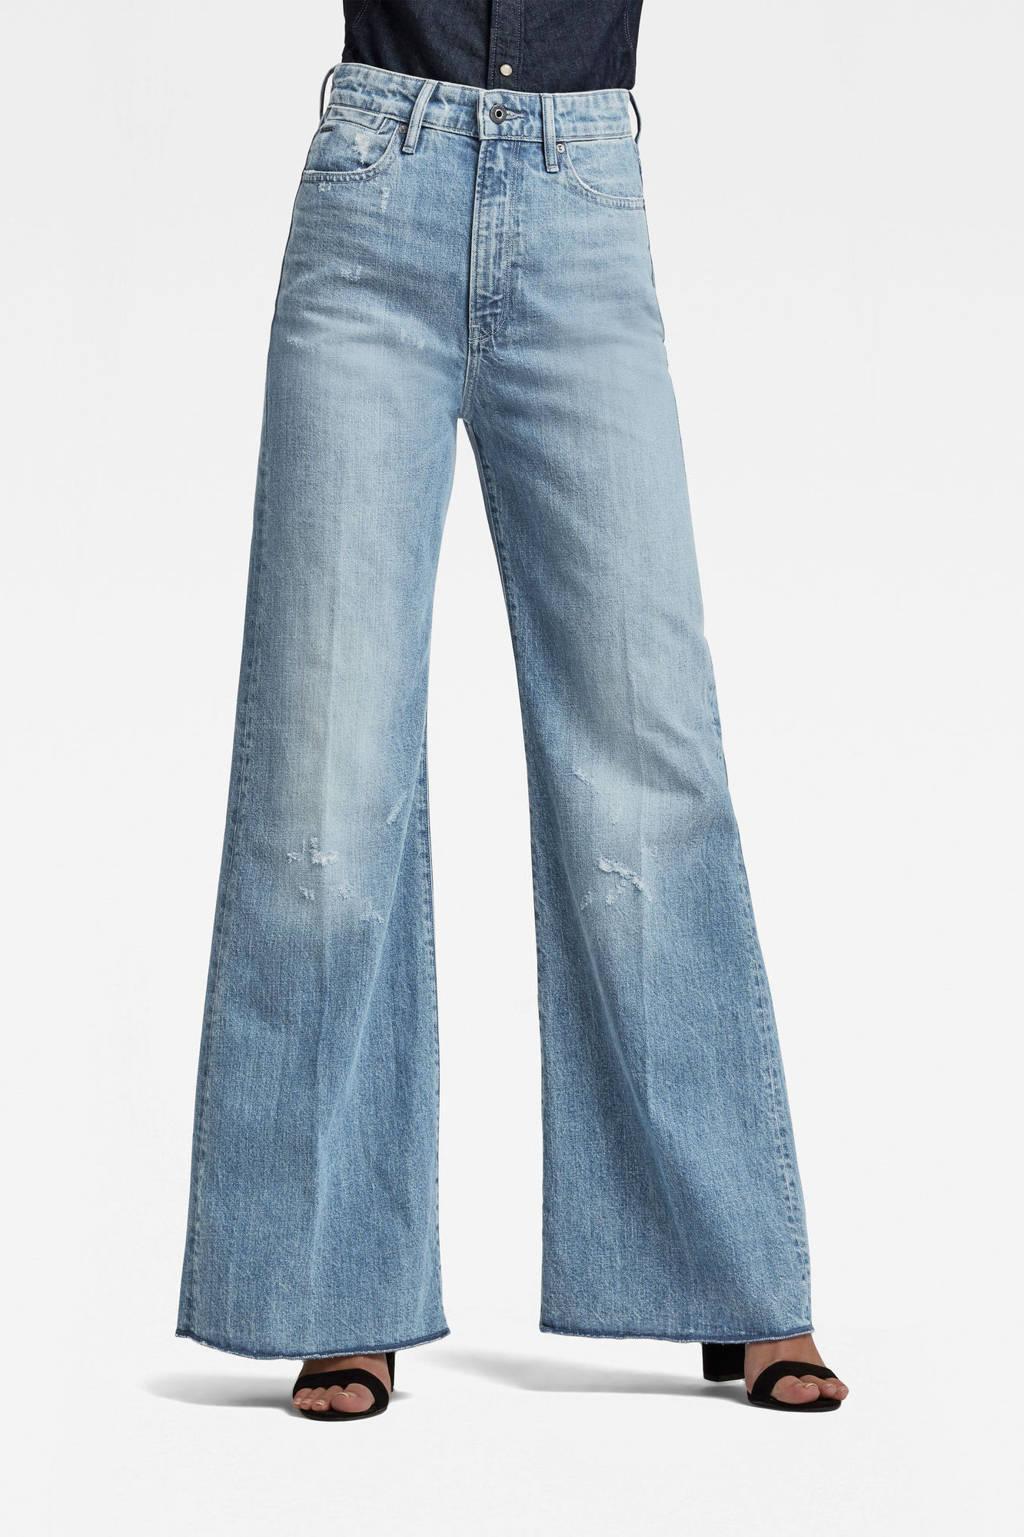 G-Star RAW high waist loose fit jeans Sun Faded Ice Fog Destroyed, sun faded ice fog destroyed